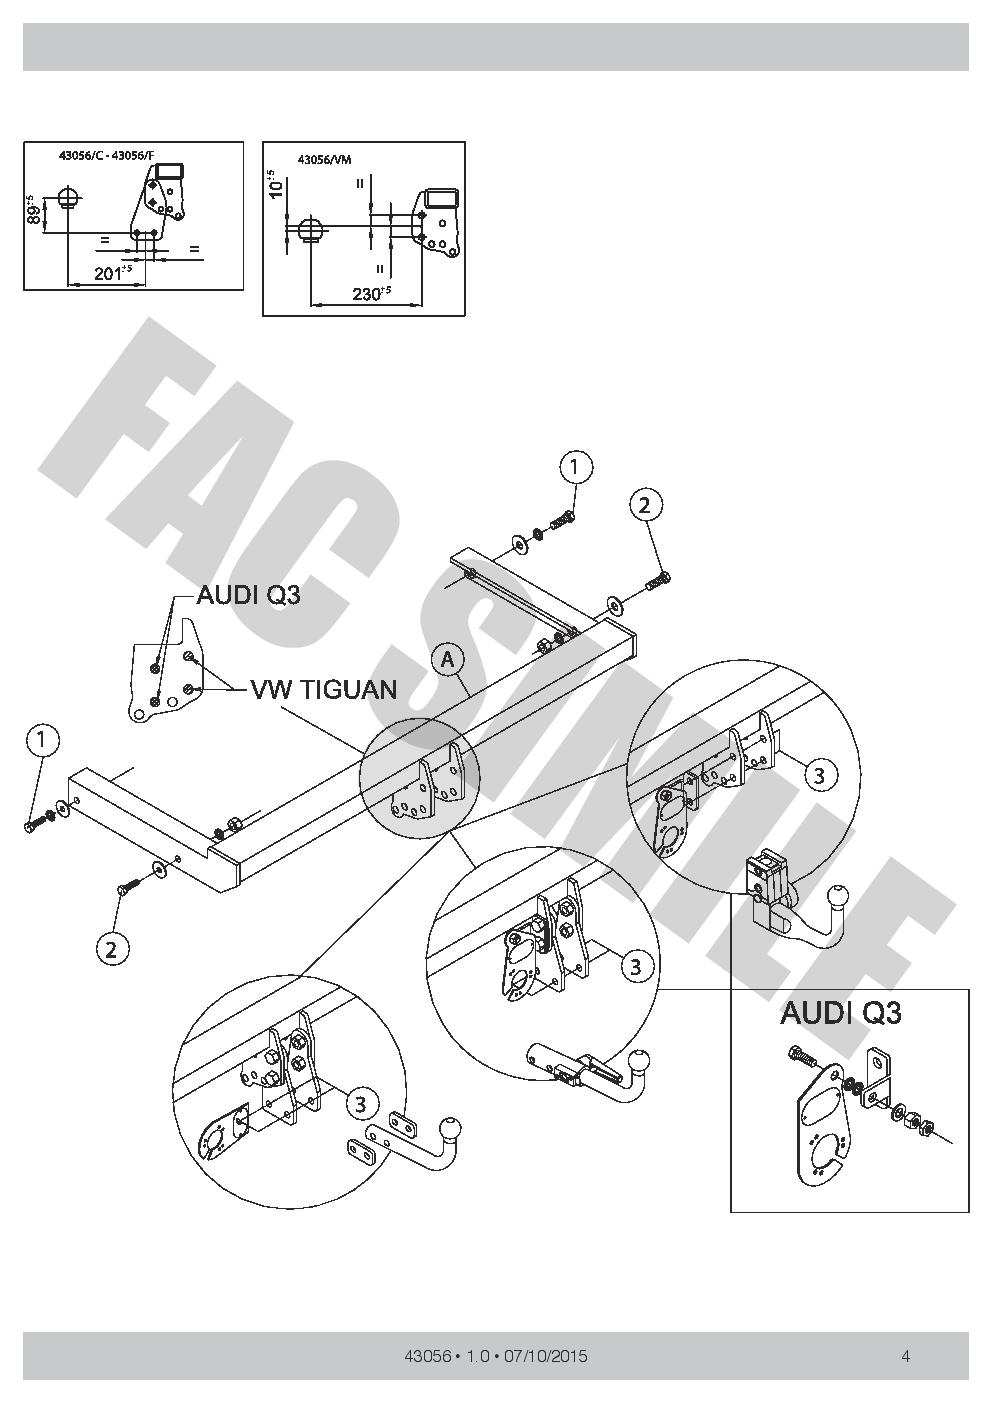 AHK 7p E-Satz C2 Anhängerkupplung Abnehmbare Ford Mondeo Kombi ab 01-07 14074C